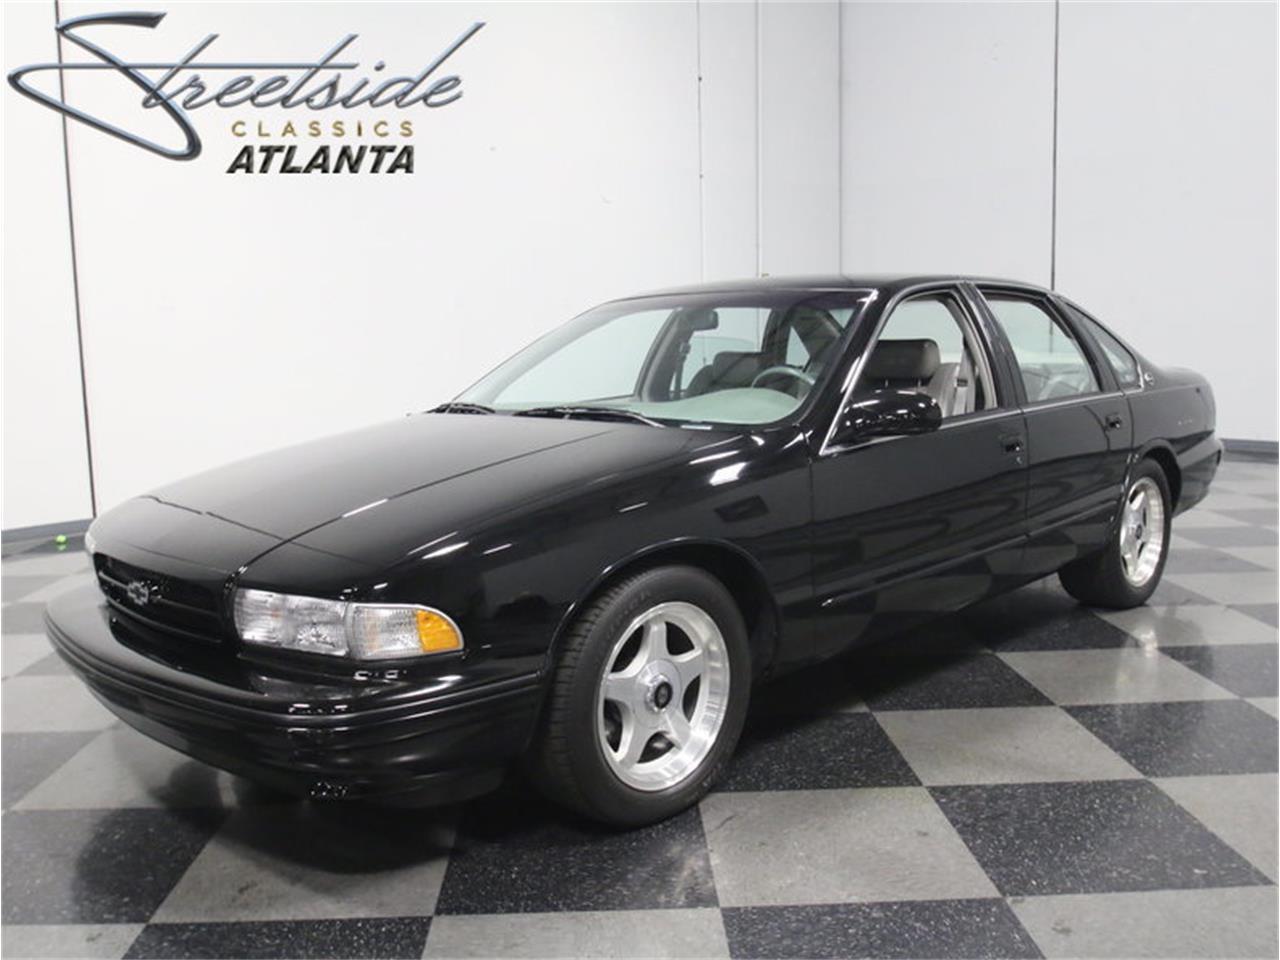 1995 chevrolet impala ss for sale | classiccars.com | cc ... 1995 chevy impala ss fuses box #12